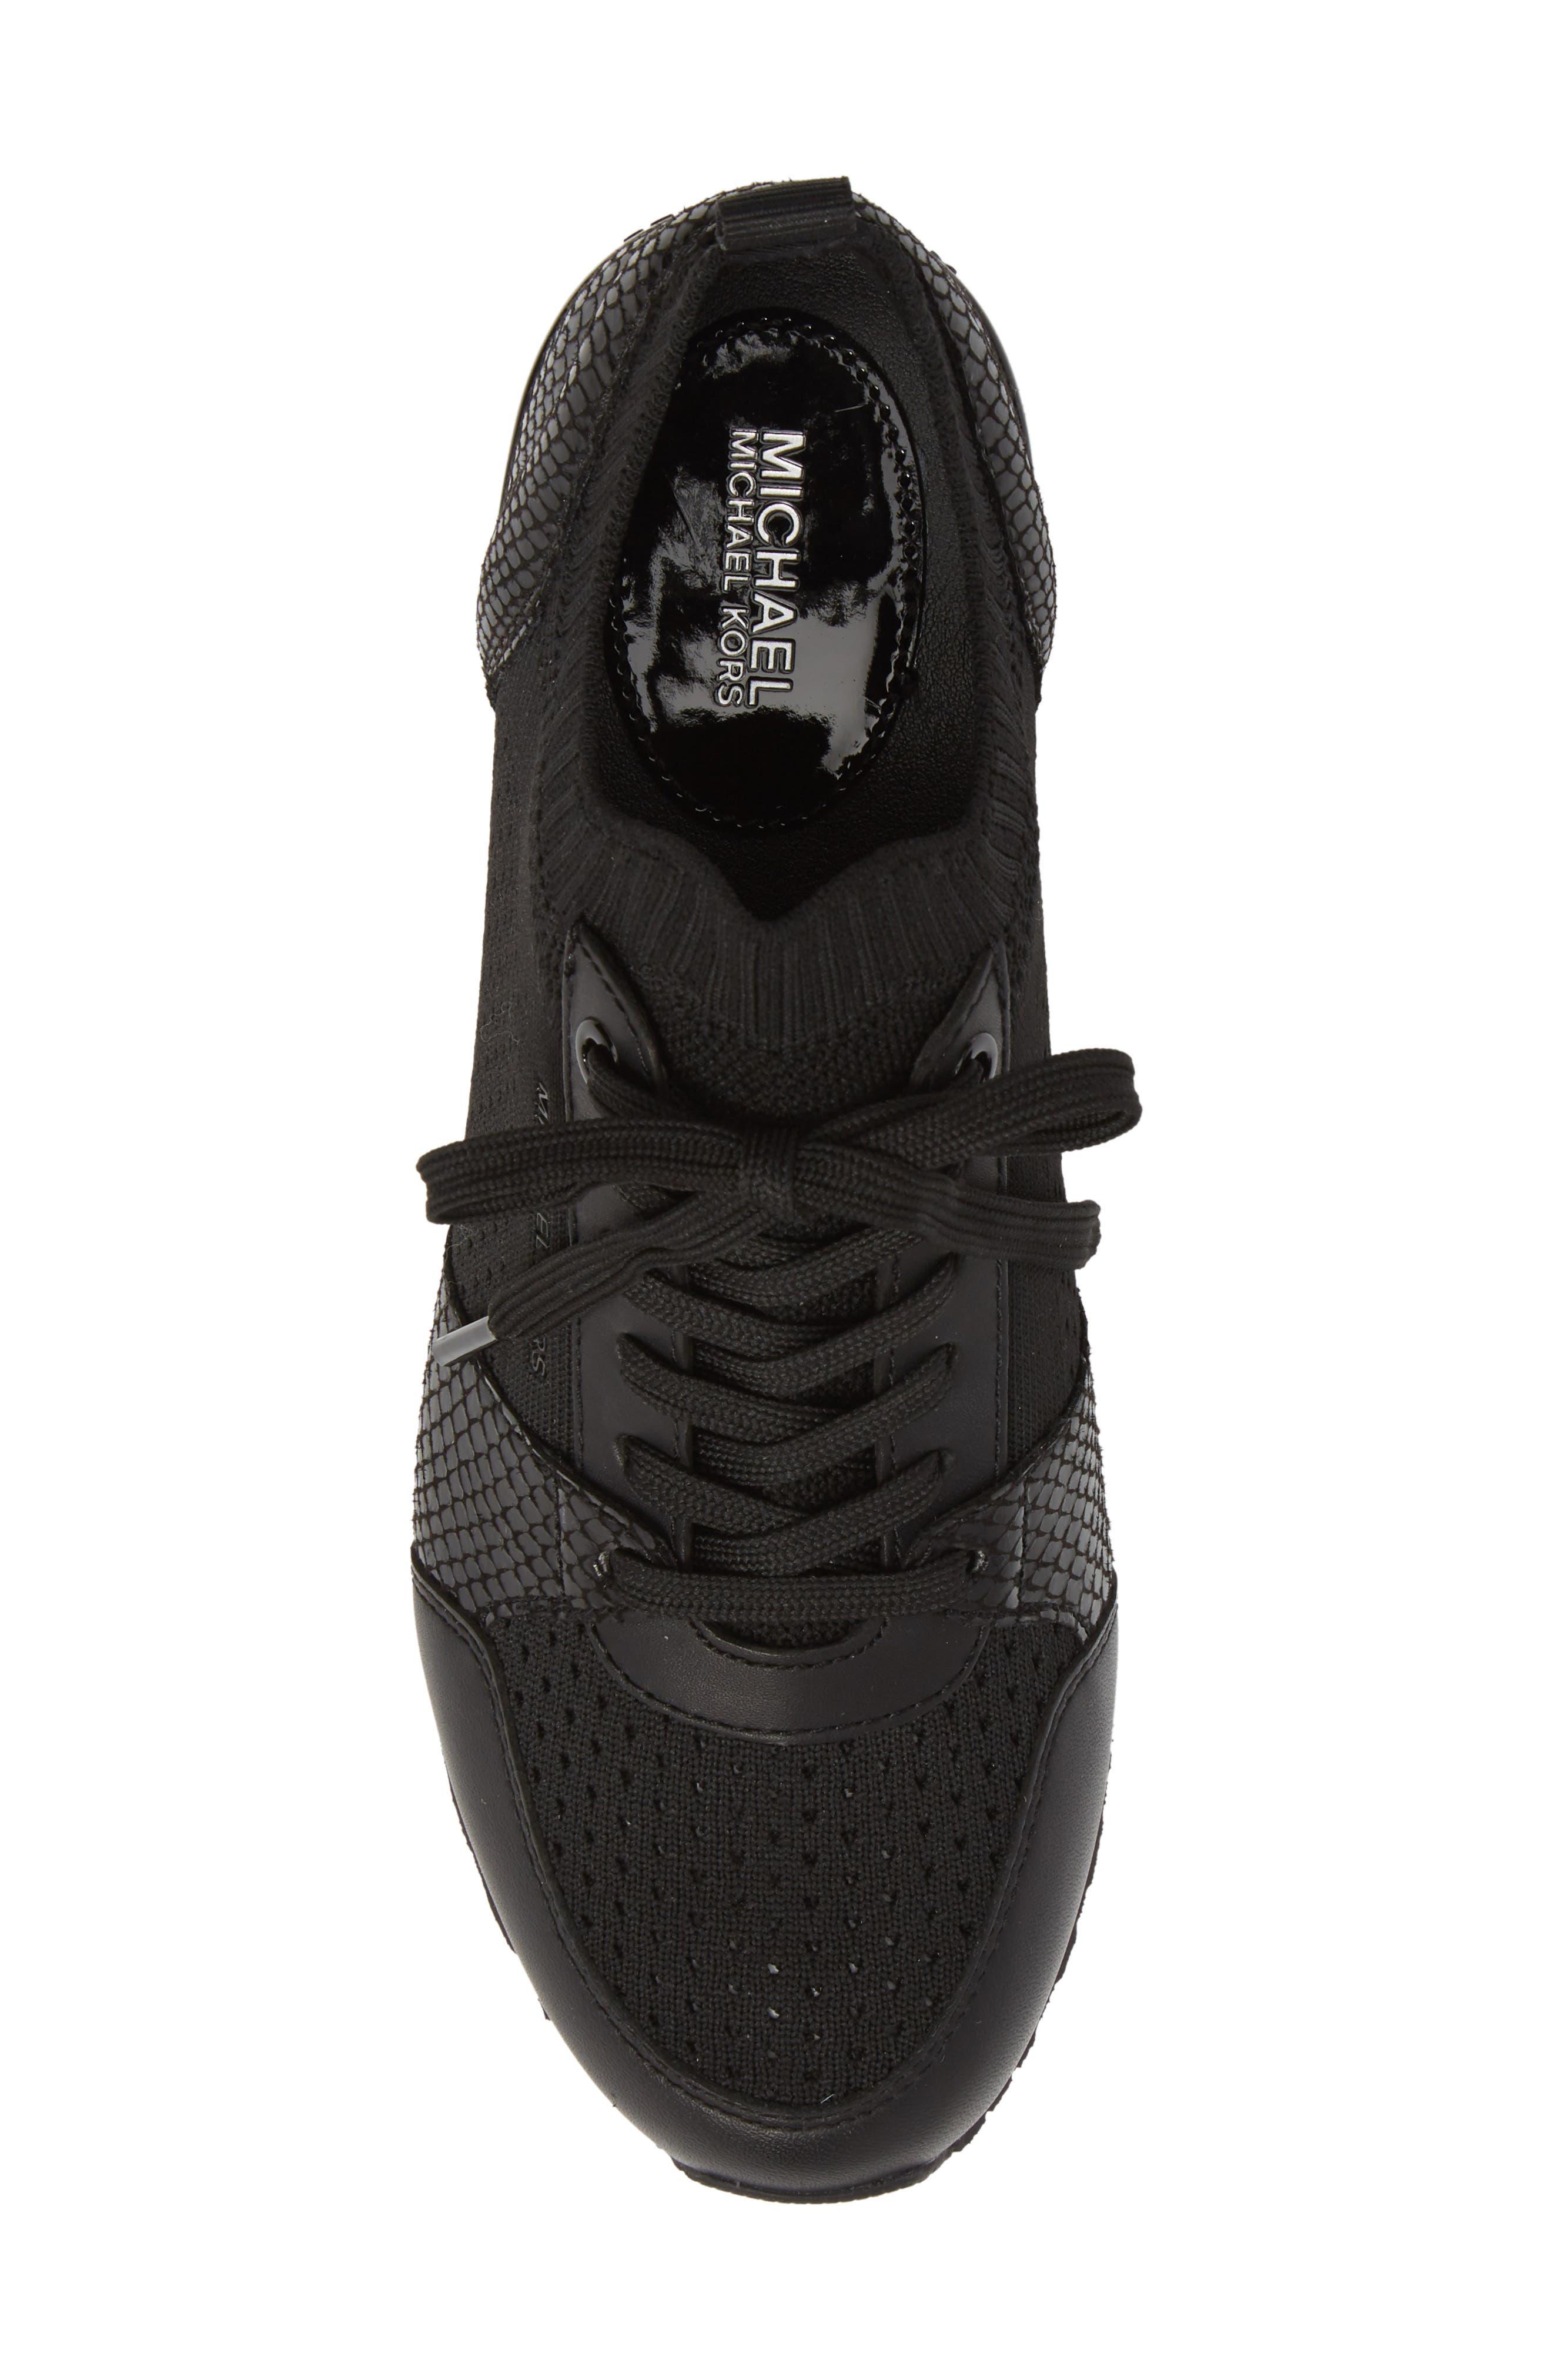 Billie Perforated Sneaker,                             Alternate thumbnail 5, color,                             002